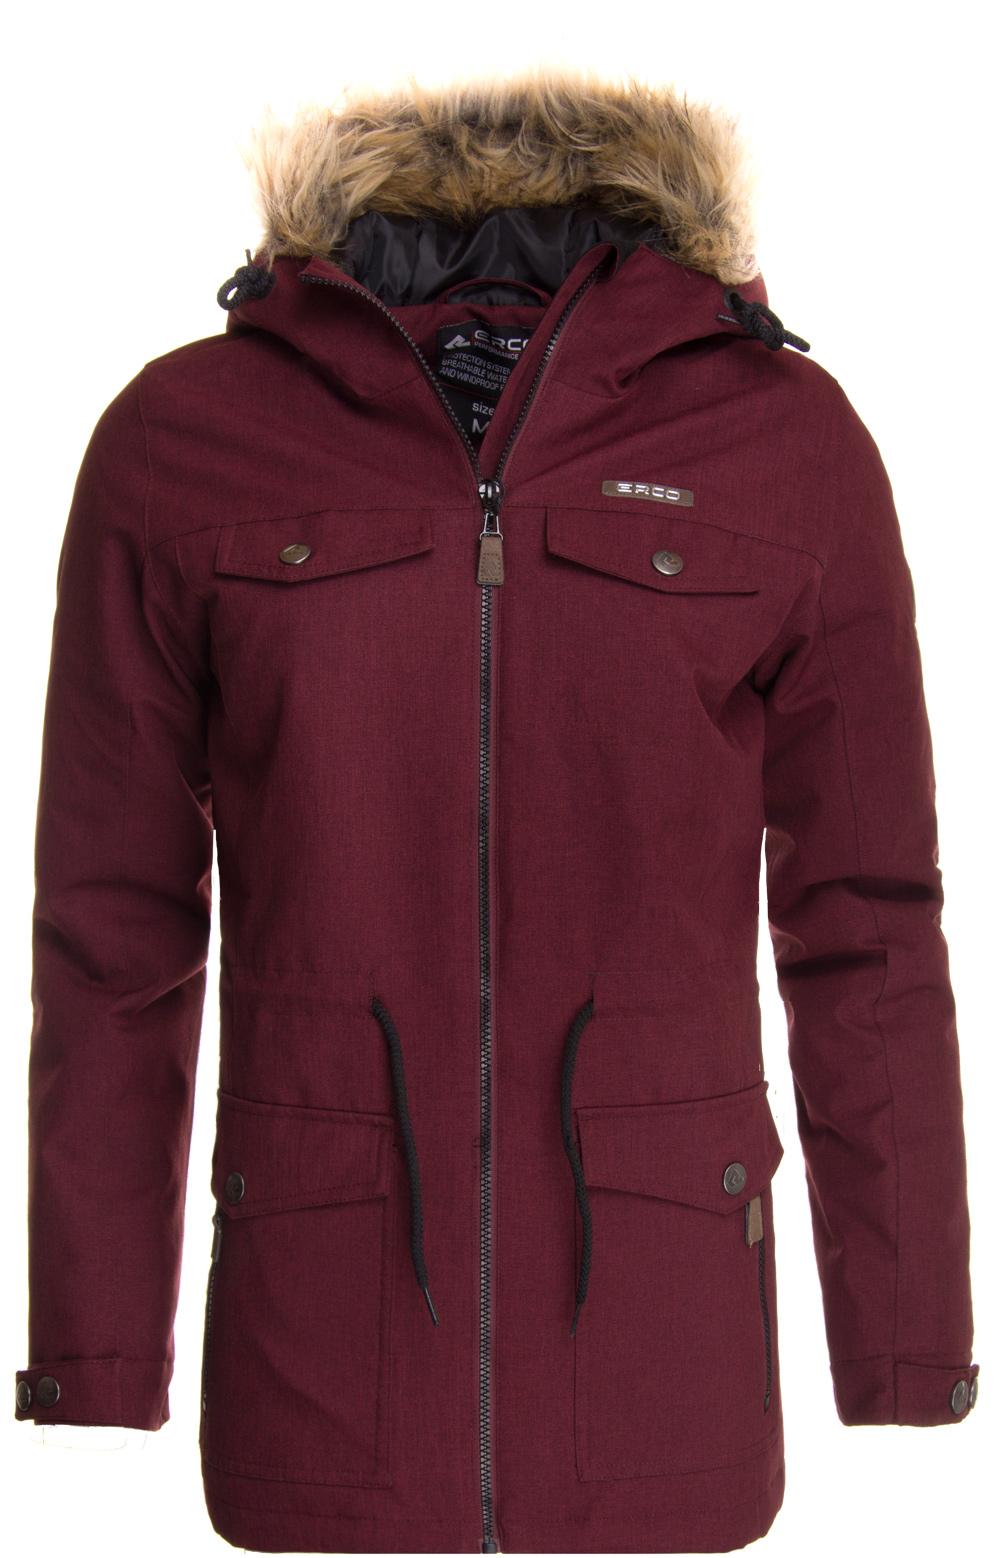 Zimná bunda dámska ERCO DARONIA